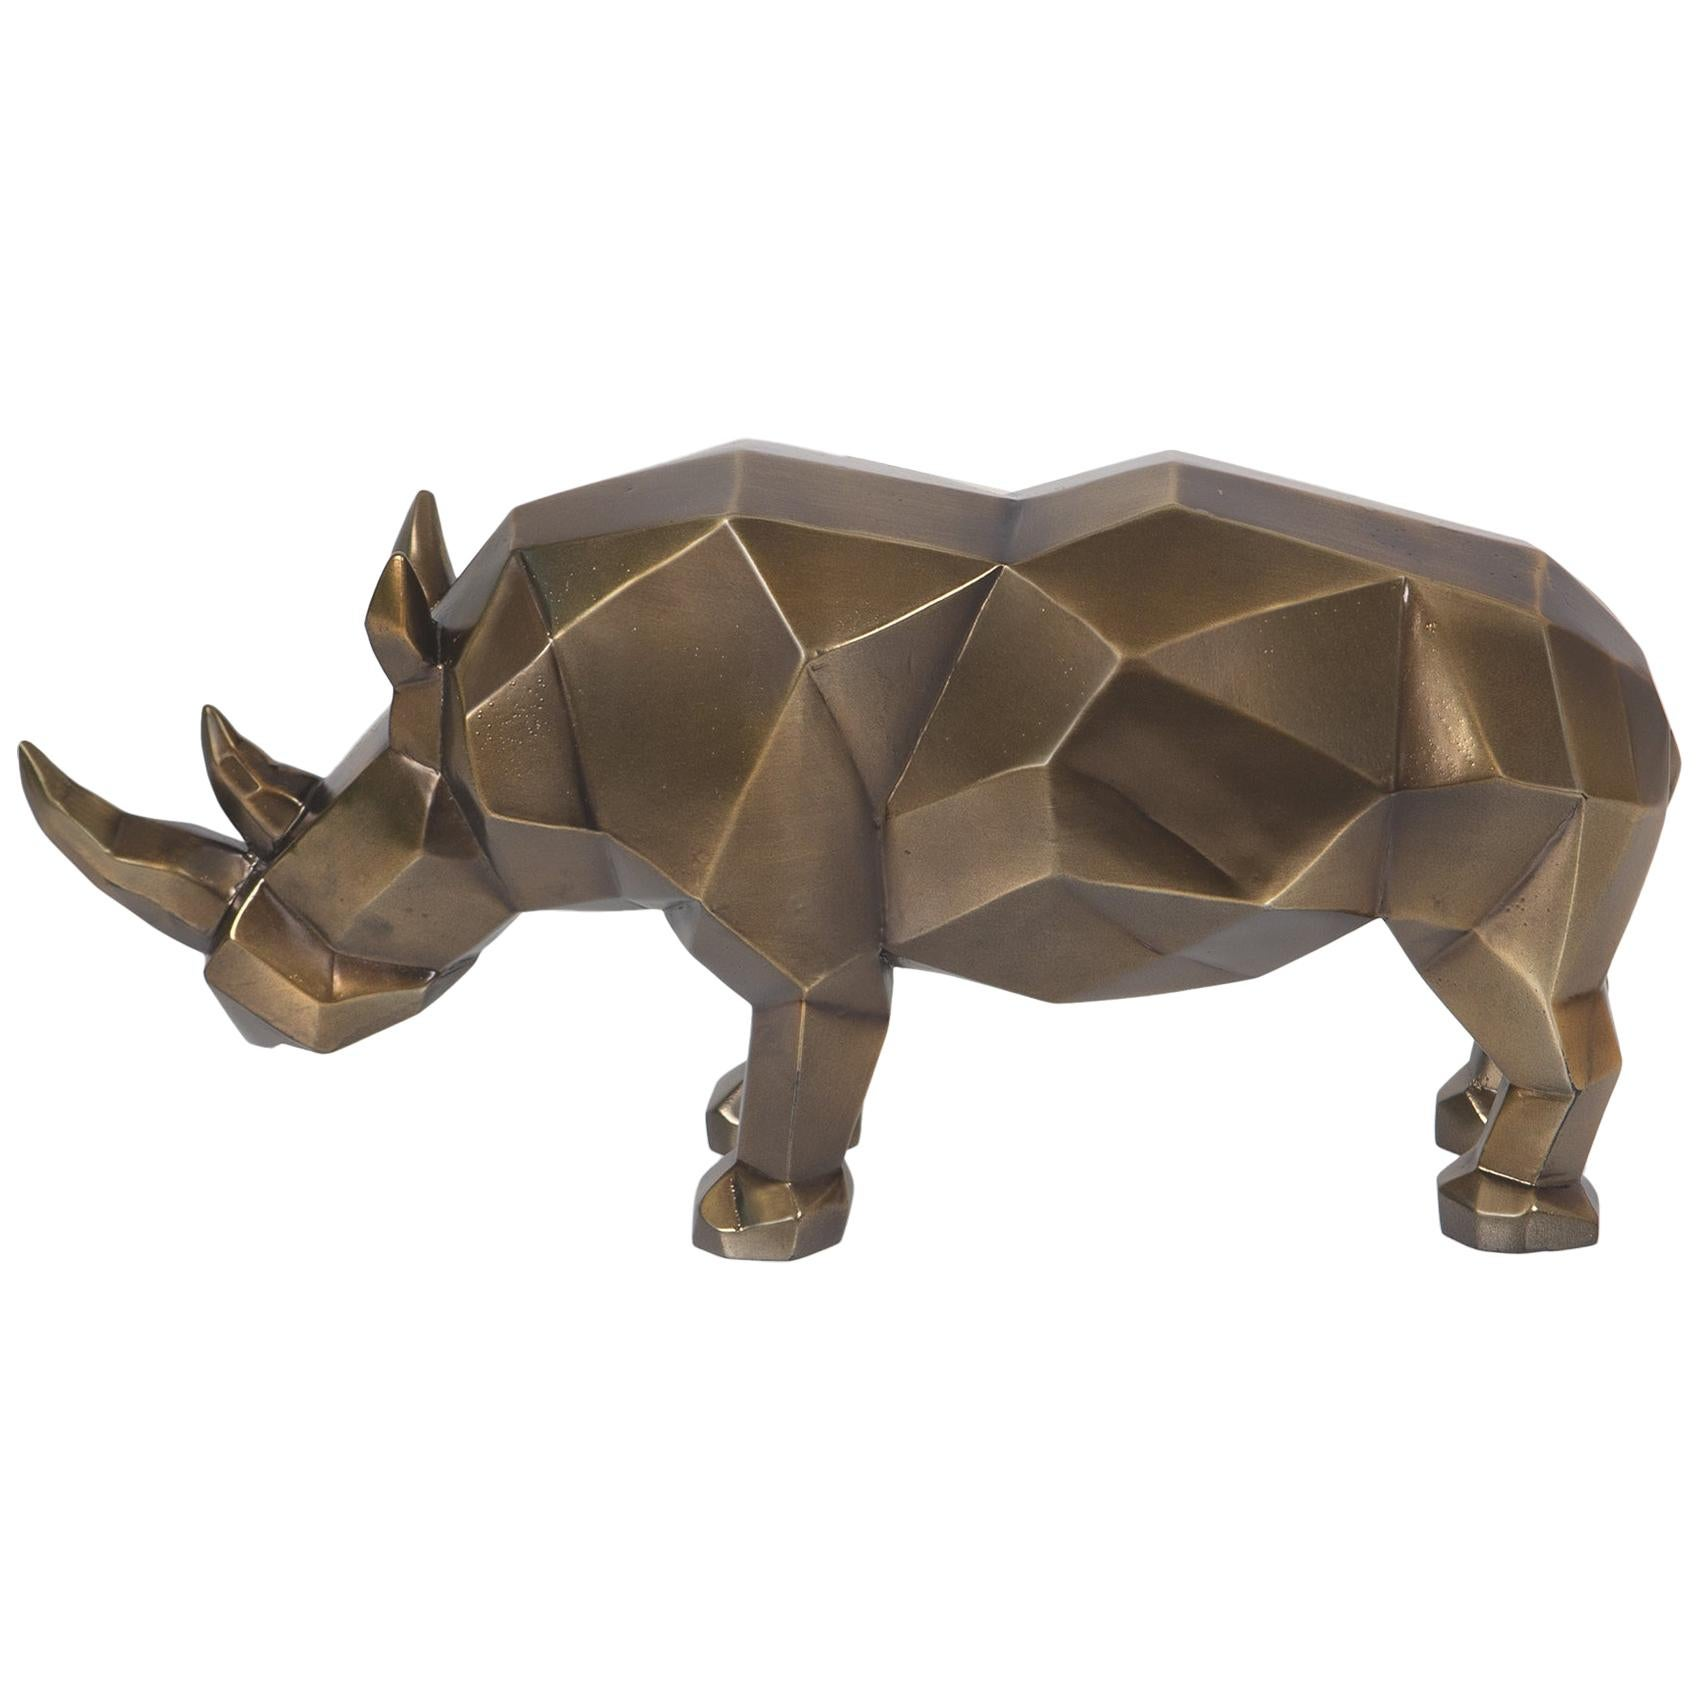 Rhino Resin Sculpture